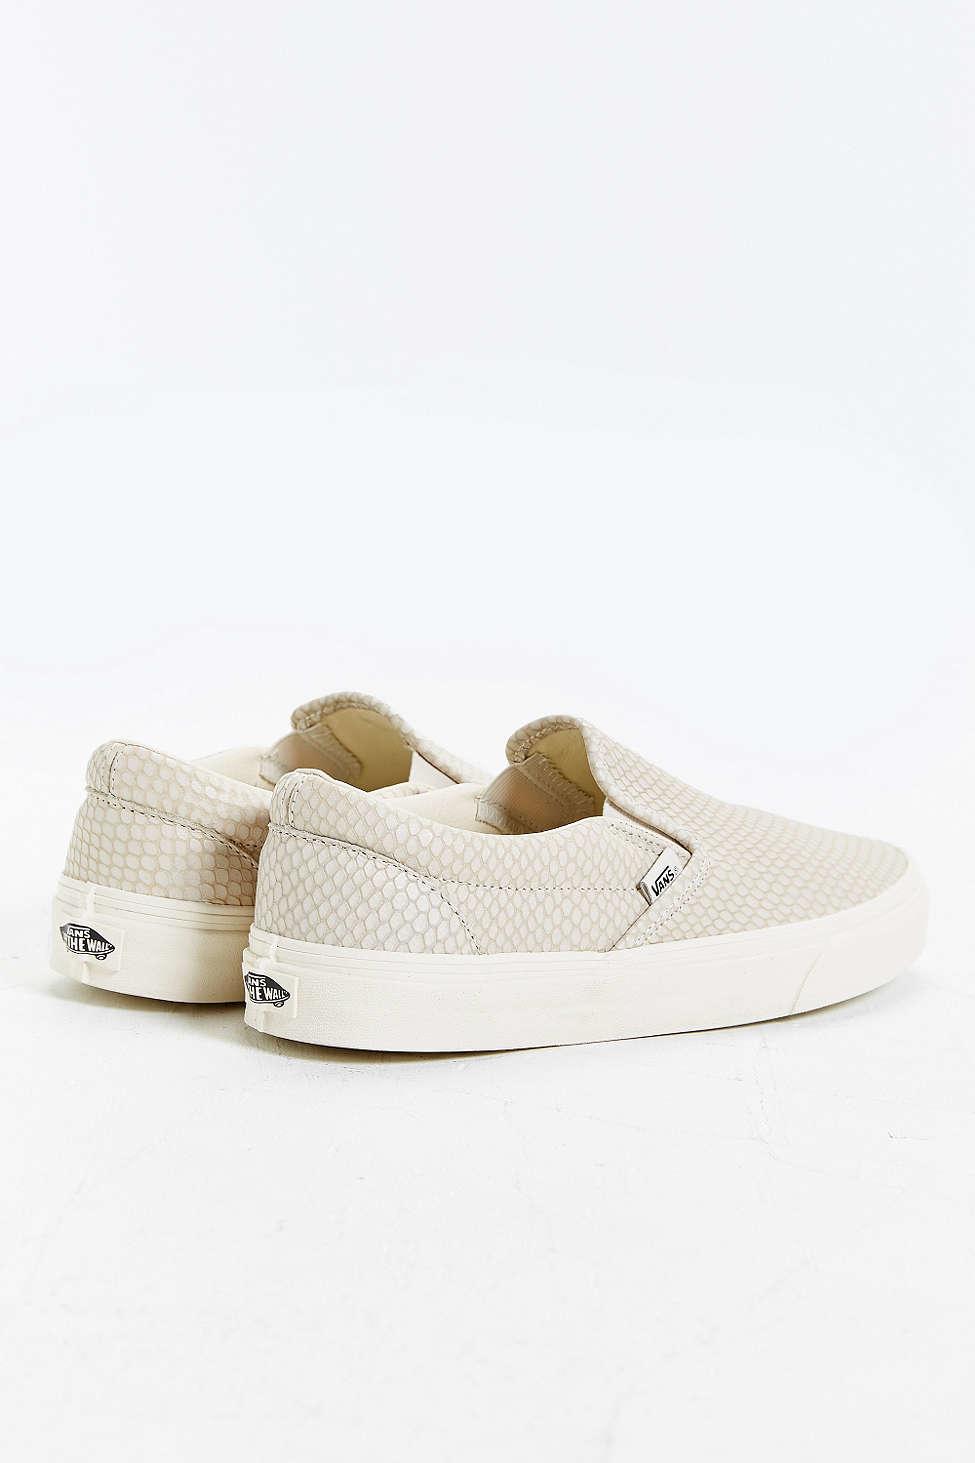 b7c3f0fa28 Lyst - Vans Snake Leather Classic Slip-on Sneaker in Natural for Men